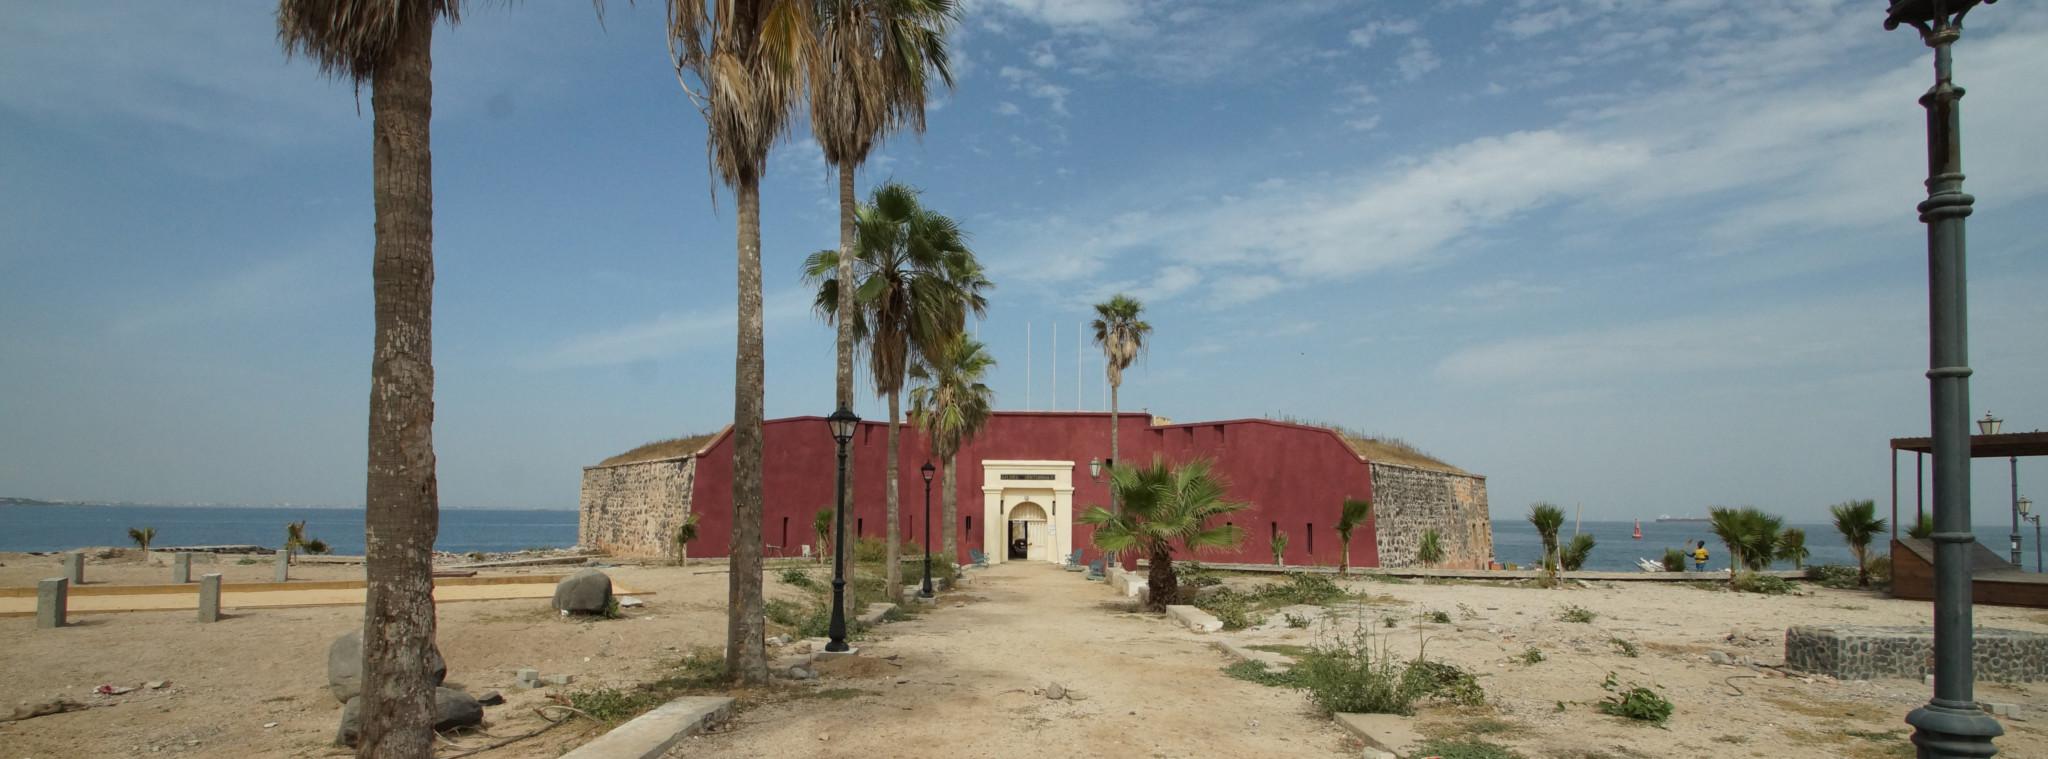 Senegal Urlaub